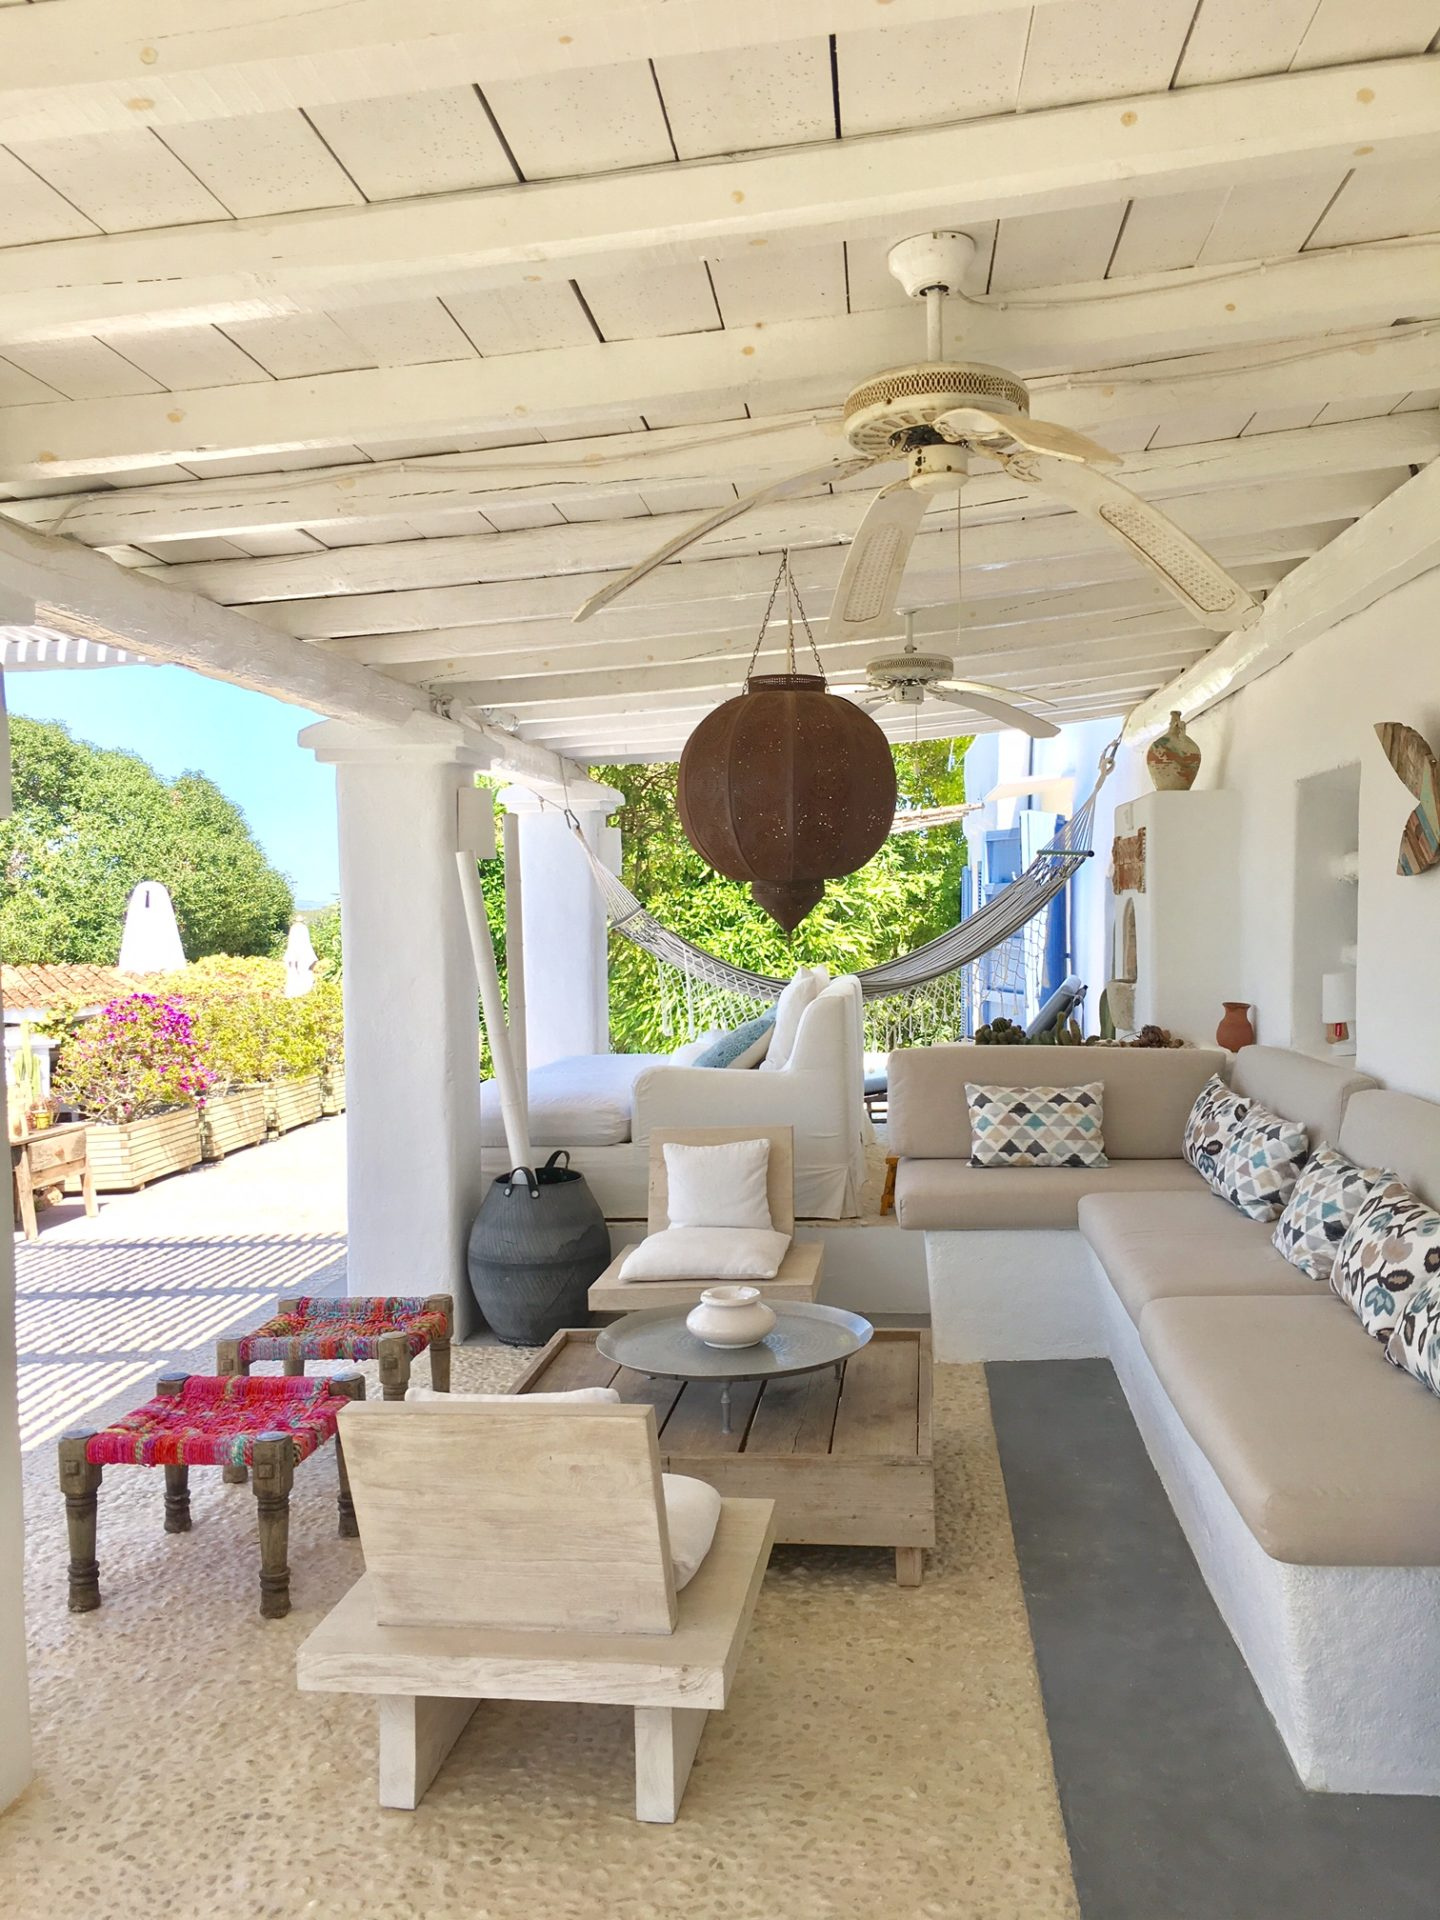 Enjoy Area Villa Your Stay Cala Tarida Ibiza Outdoor Seating